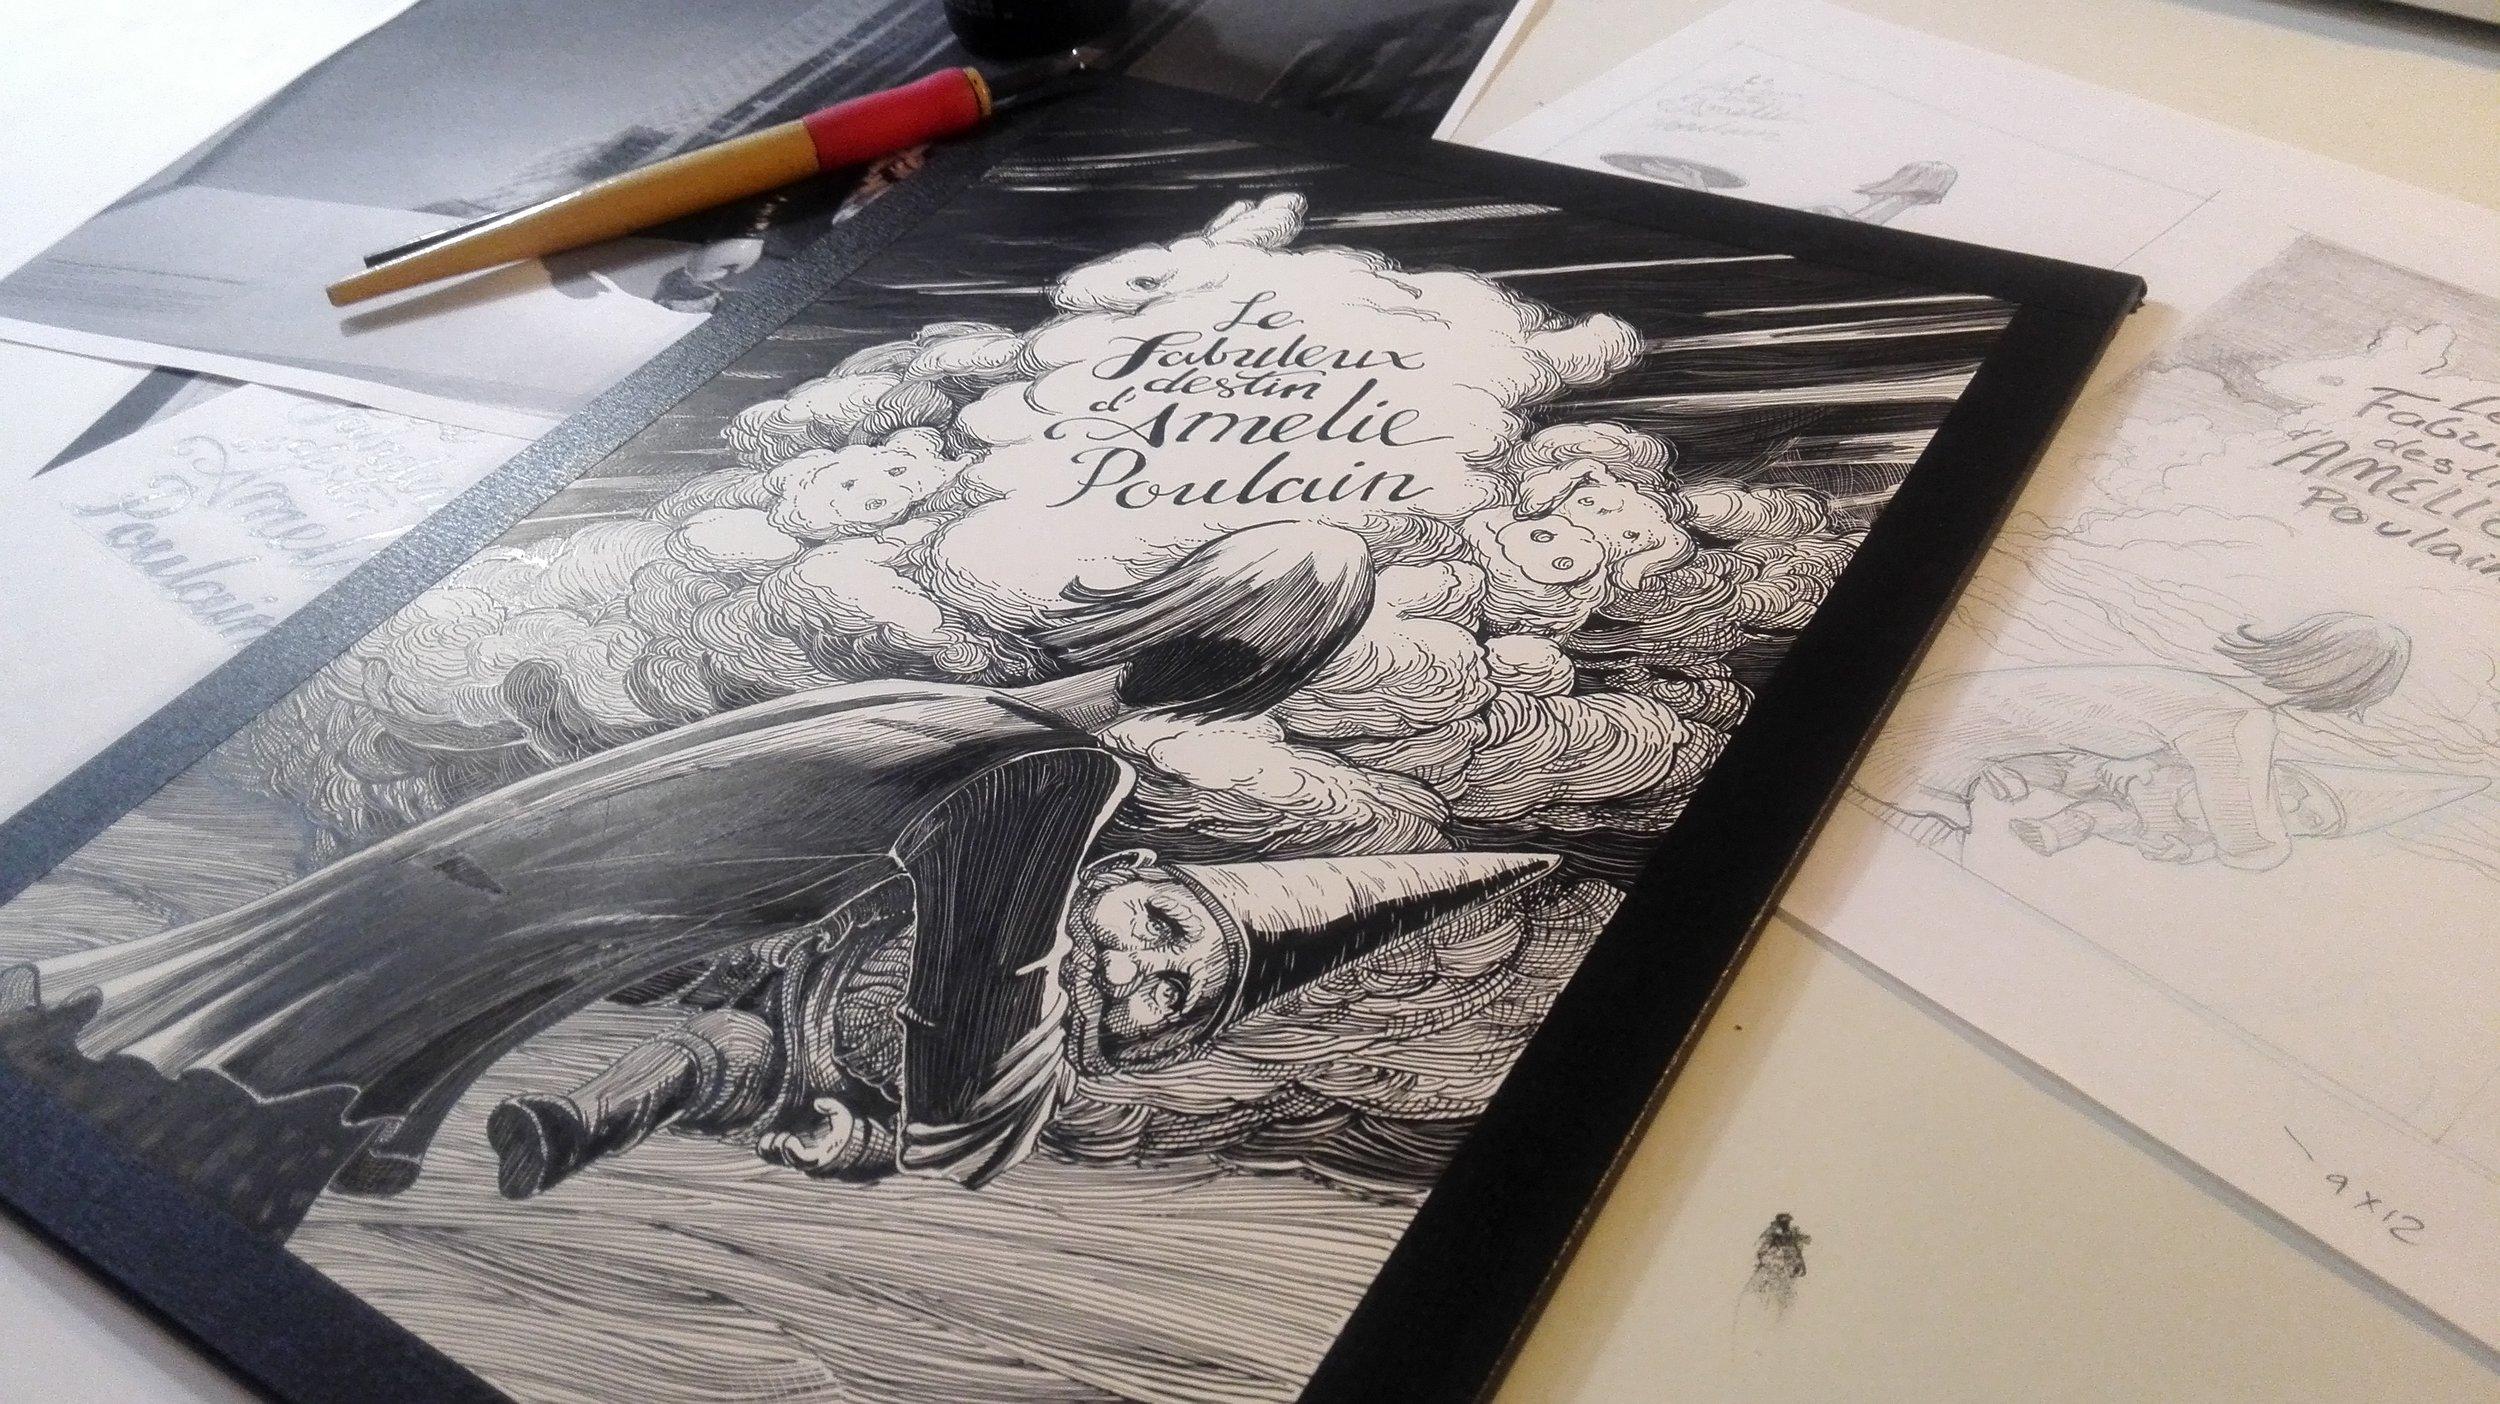 2RC©-Amelie Poulain-04 sketch.jpg